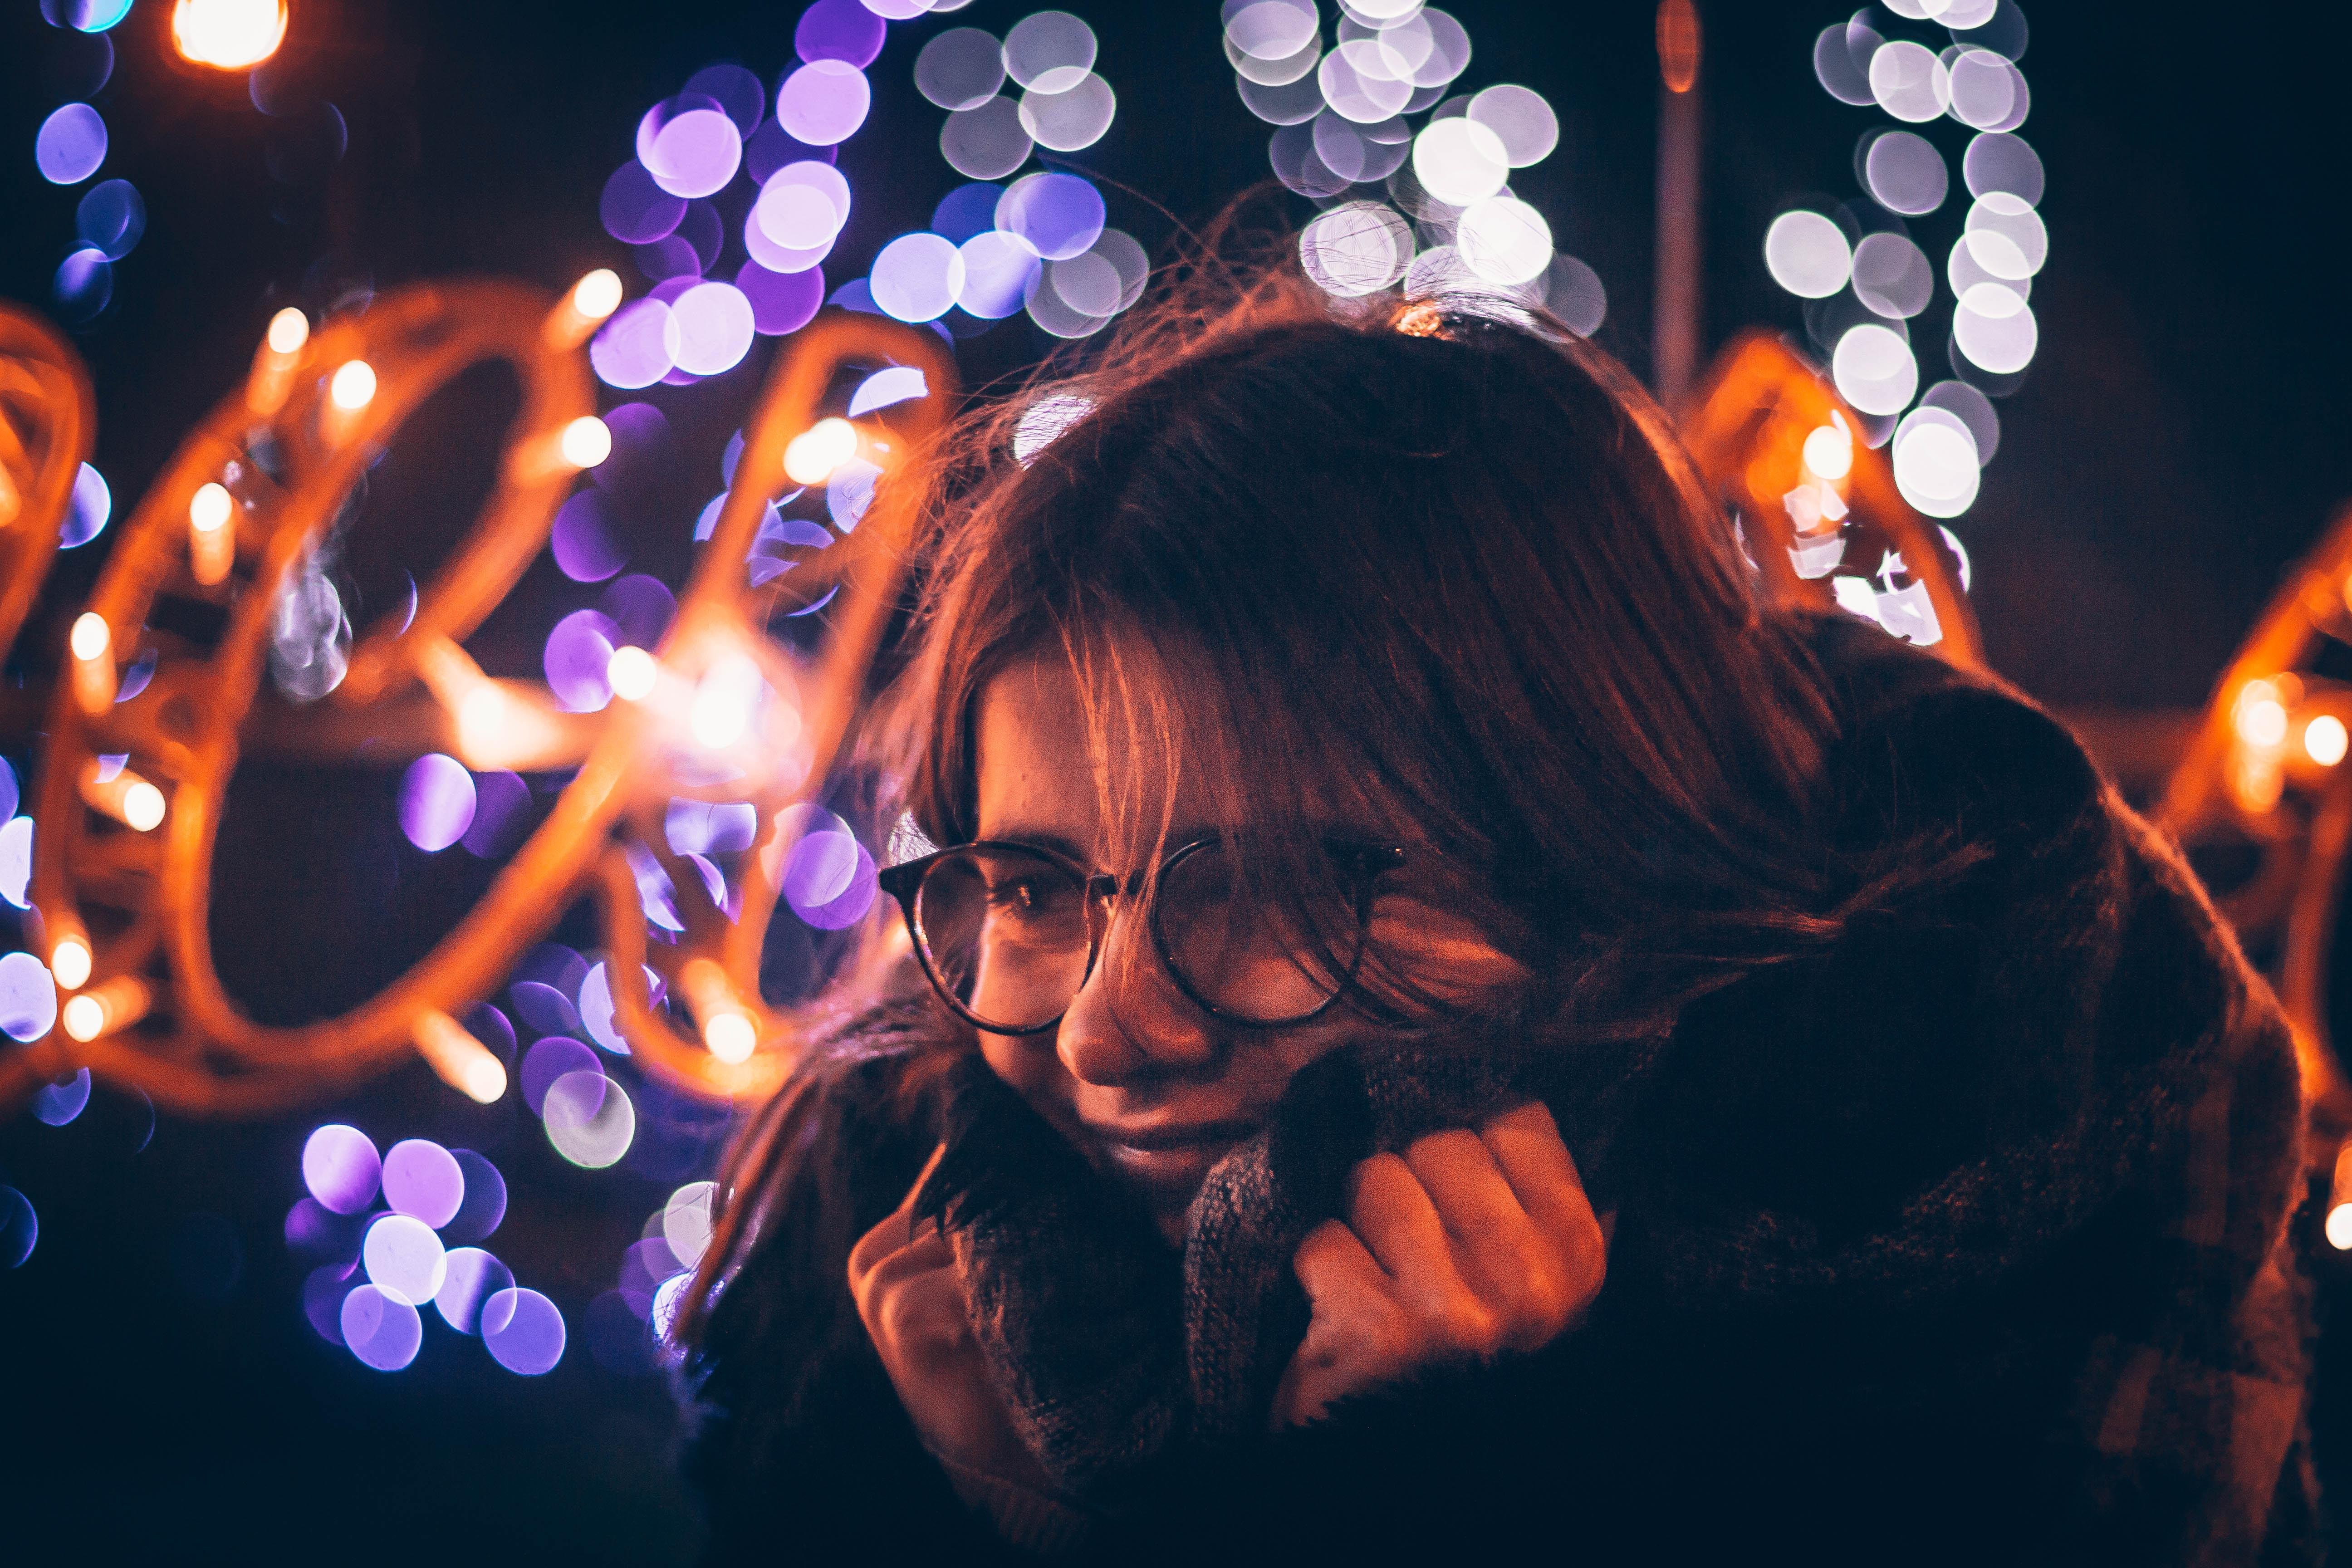 bokeh photography of woman holding coat wearing eyeglasses